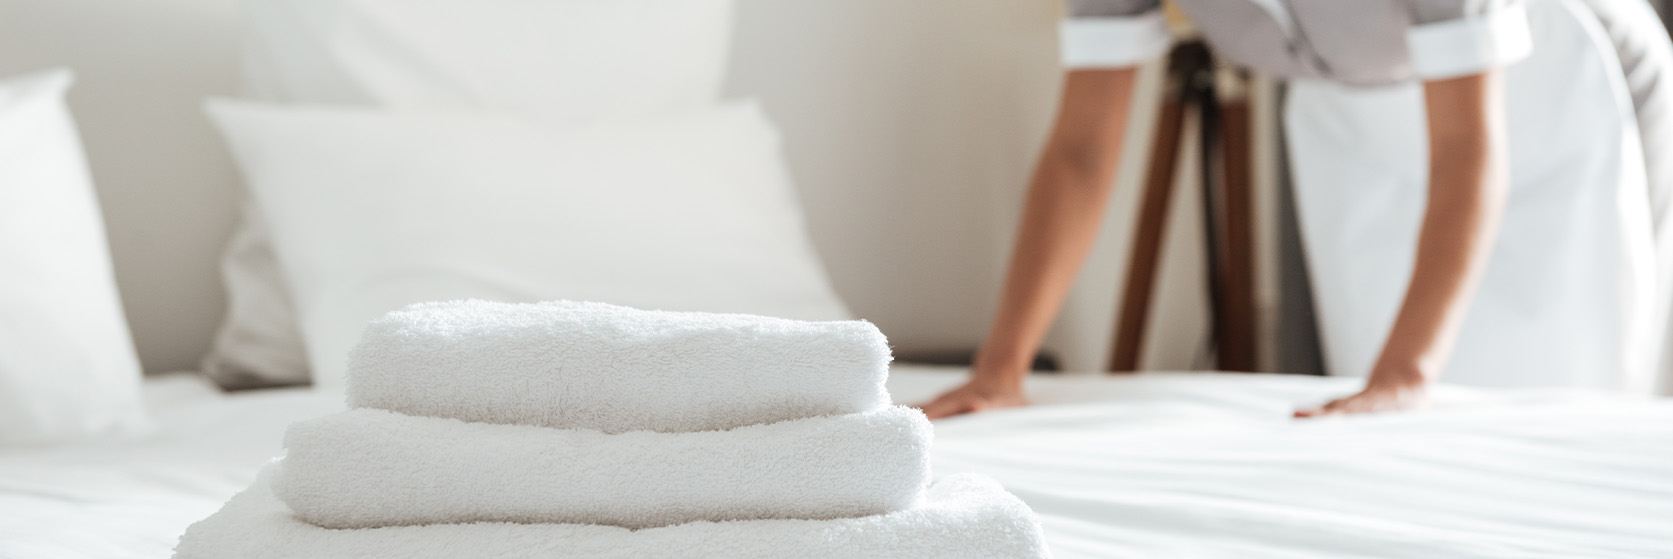 Hospitality Laundry